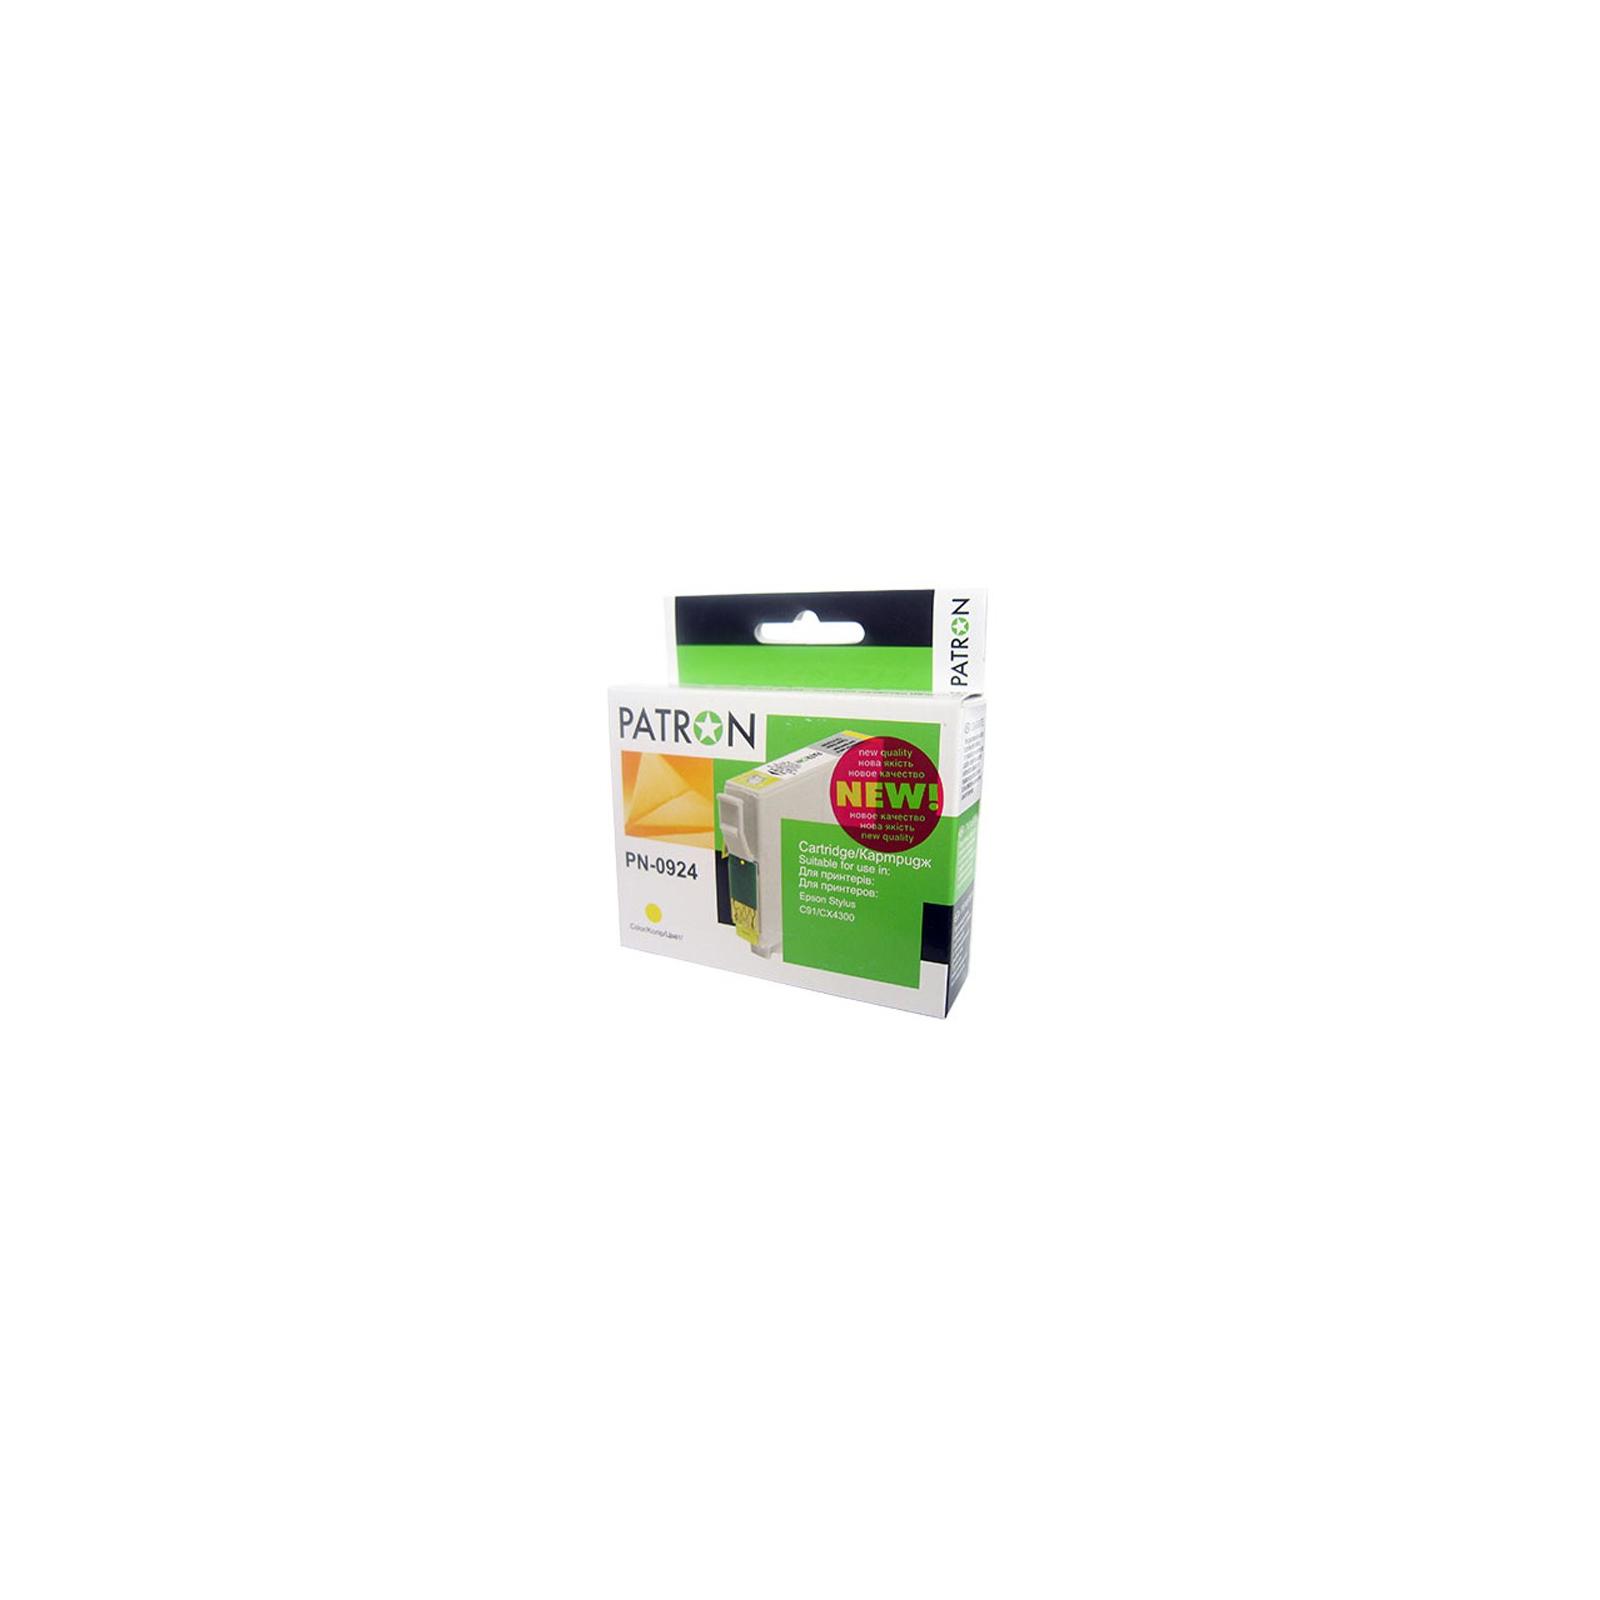 Картридж PATRON для EPSON C91/T26/27/TX106 yellow (CI-EPS-T09244A-Y2-PN) изображение 2